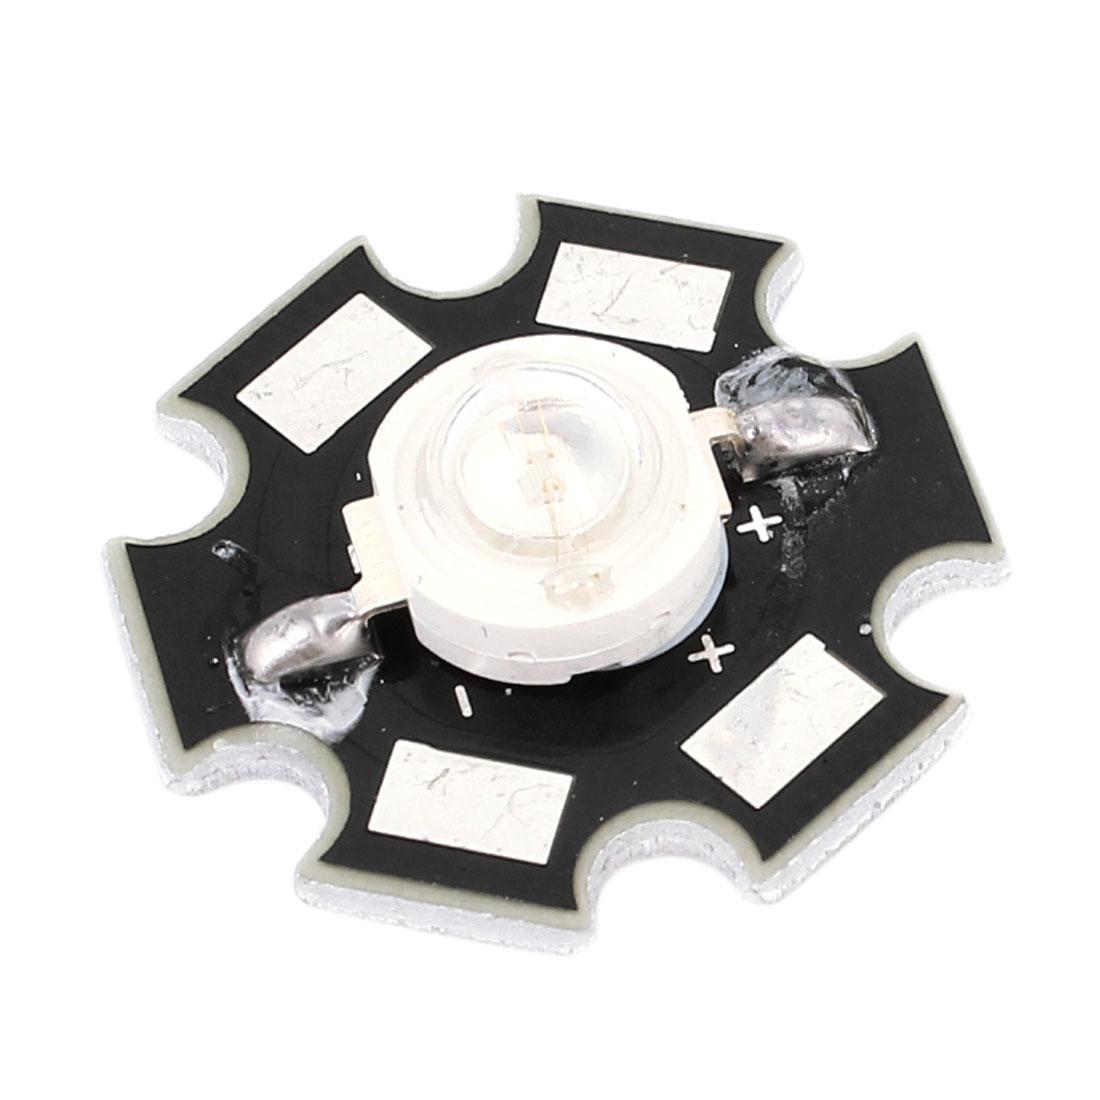 1W 25-30LM Blue LED Light Saving Energy Star Base Lamp Bead Emitter